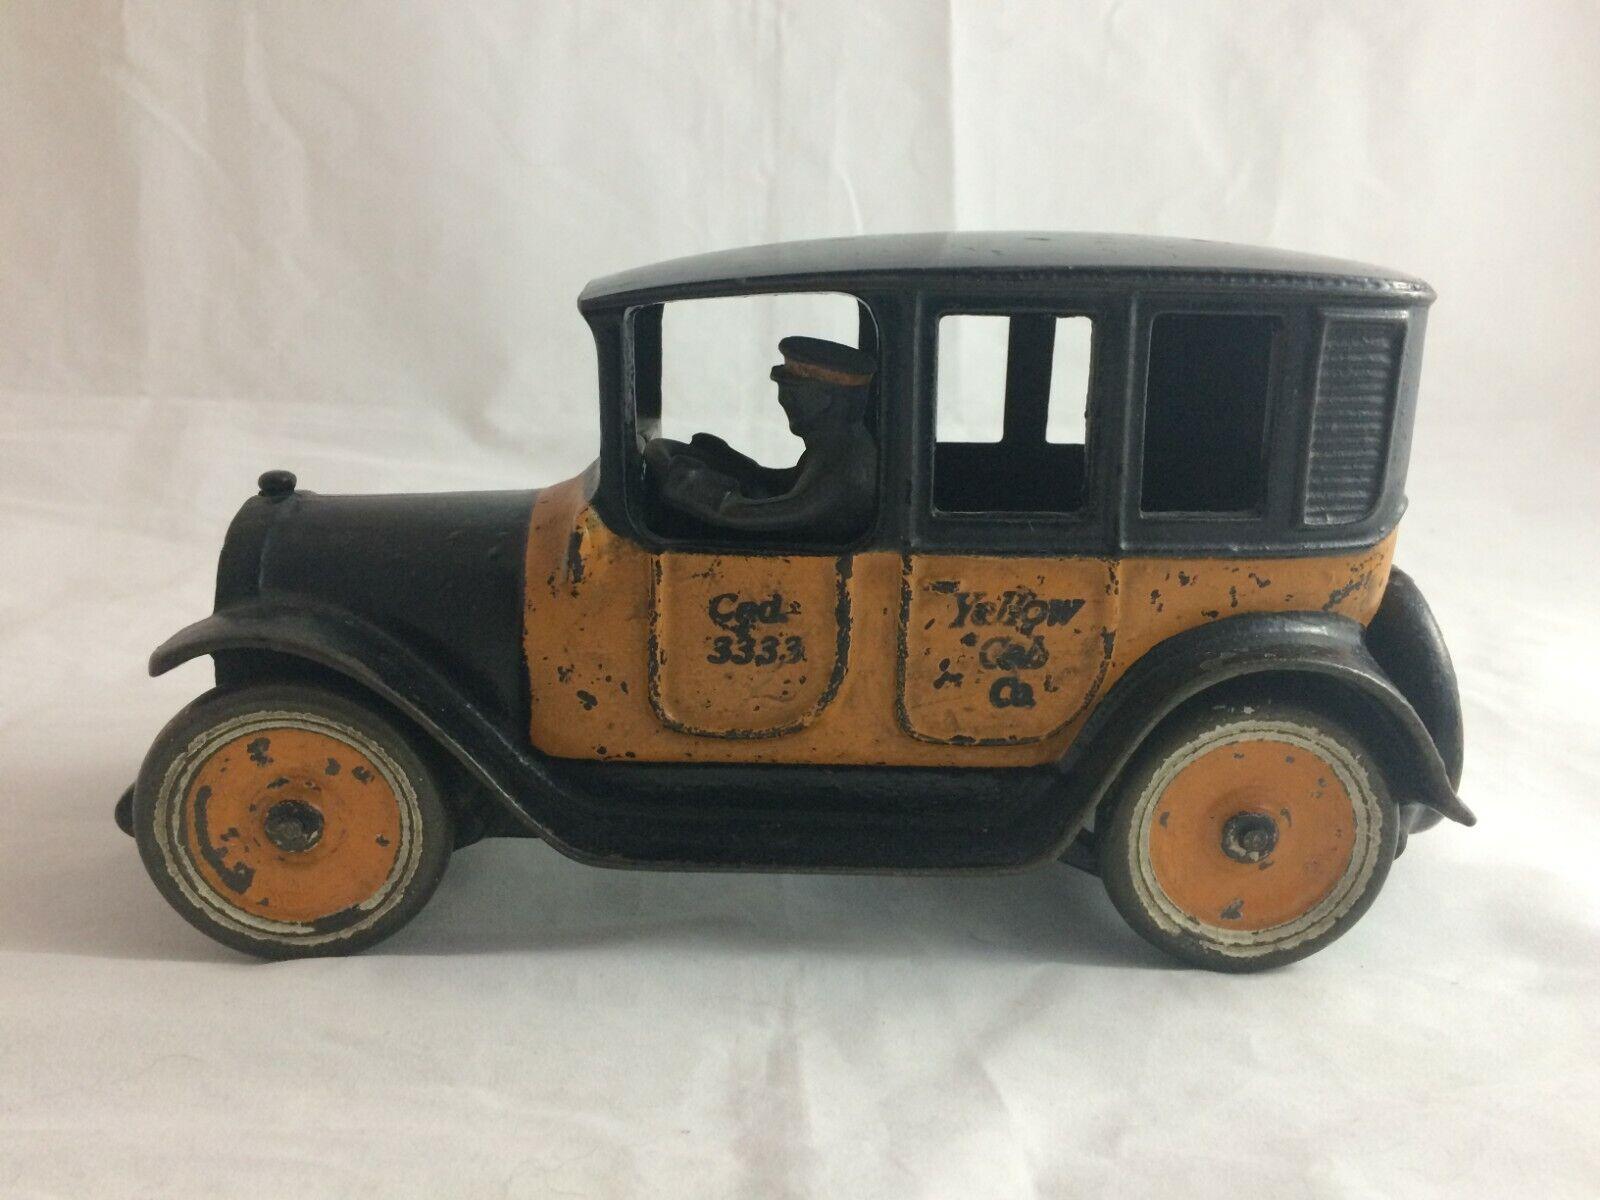 ANTIQUE ARCADE ARCADE ARCADE YELLOW TAXI CAB CAST IRON 1920's ORIGINAL PAINT TOY TAXI 9  dbe1bd